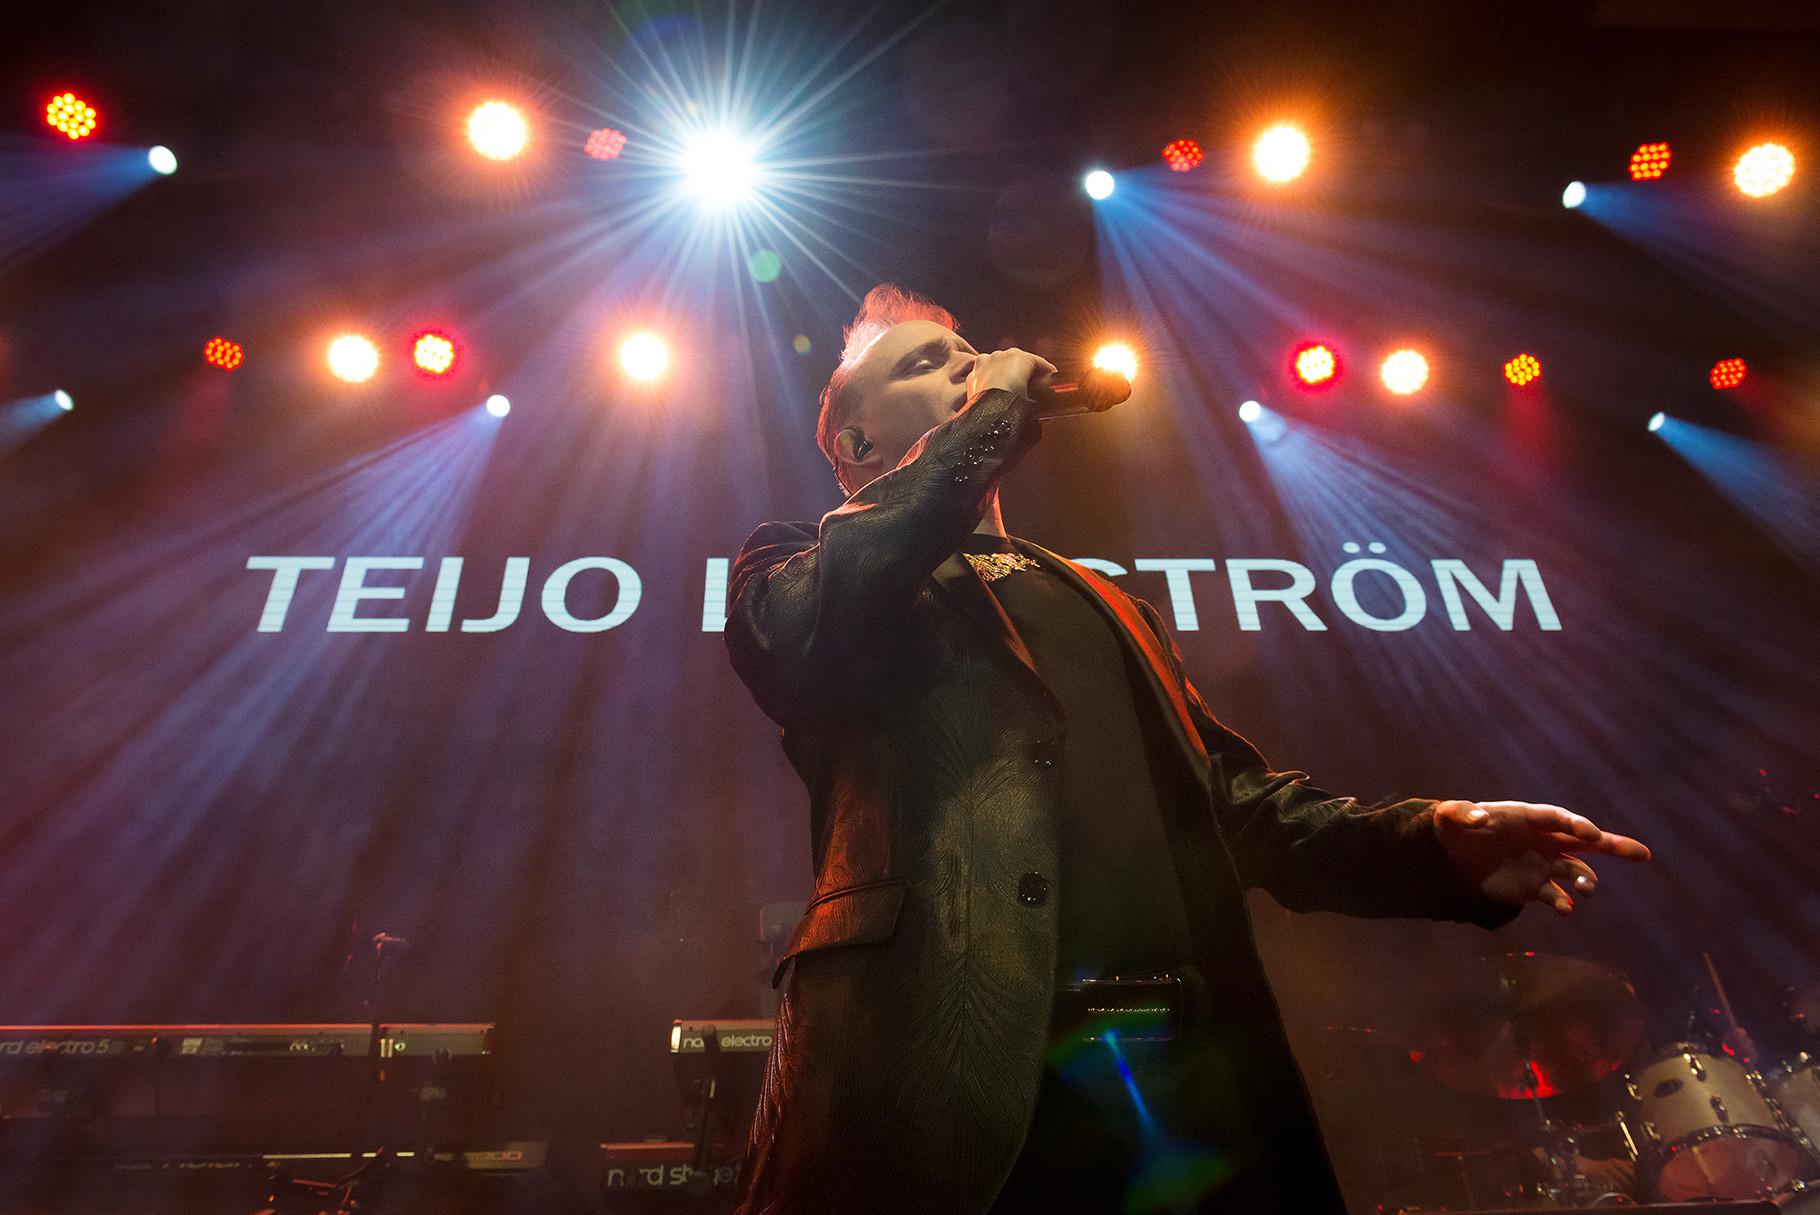 Tangokuningas Teijo Lindström live on stage in May 2018. Photo: © Heli Kaskinen 2018